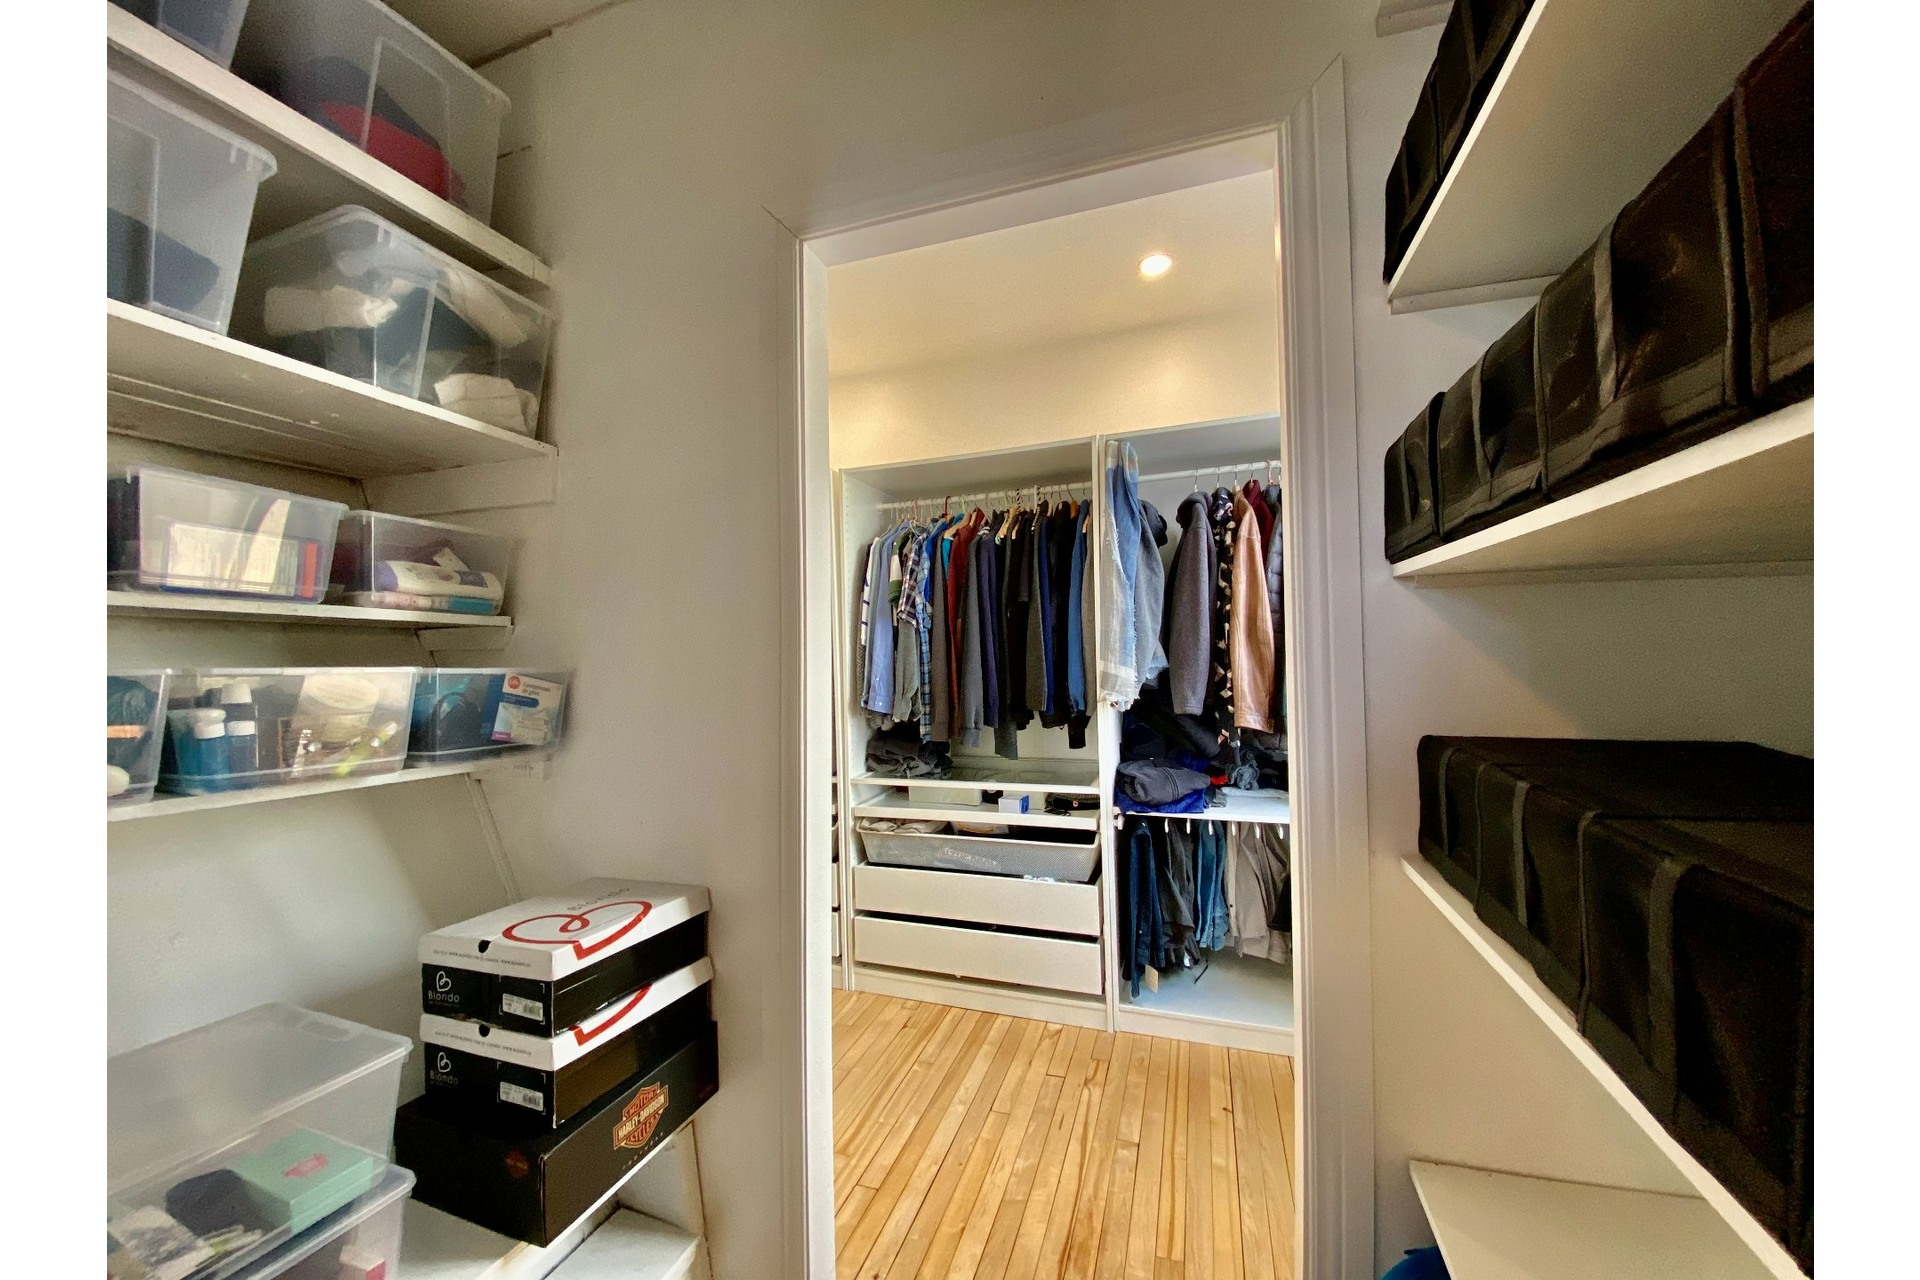 image 12 - Duplex En venta Lachine Montréal  - 6 habitaciones